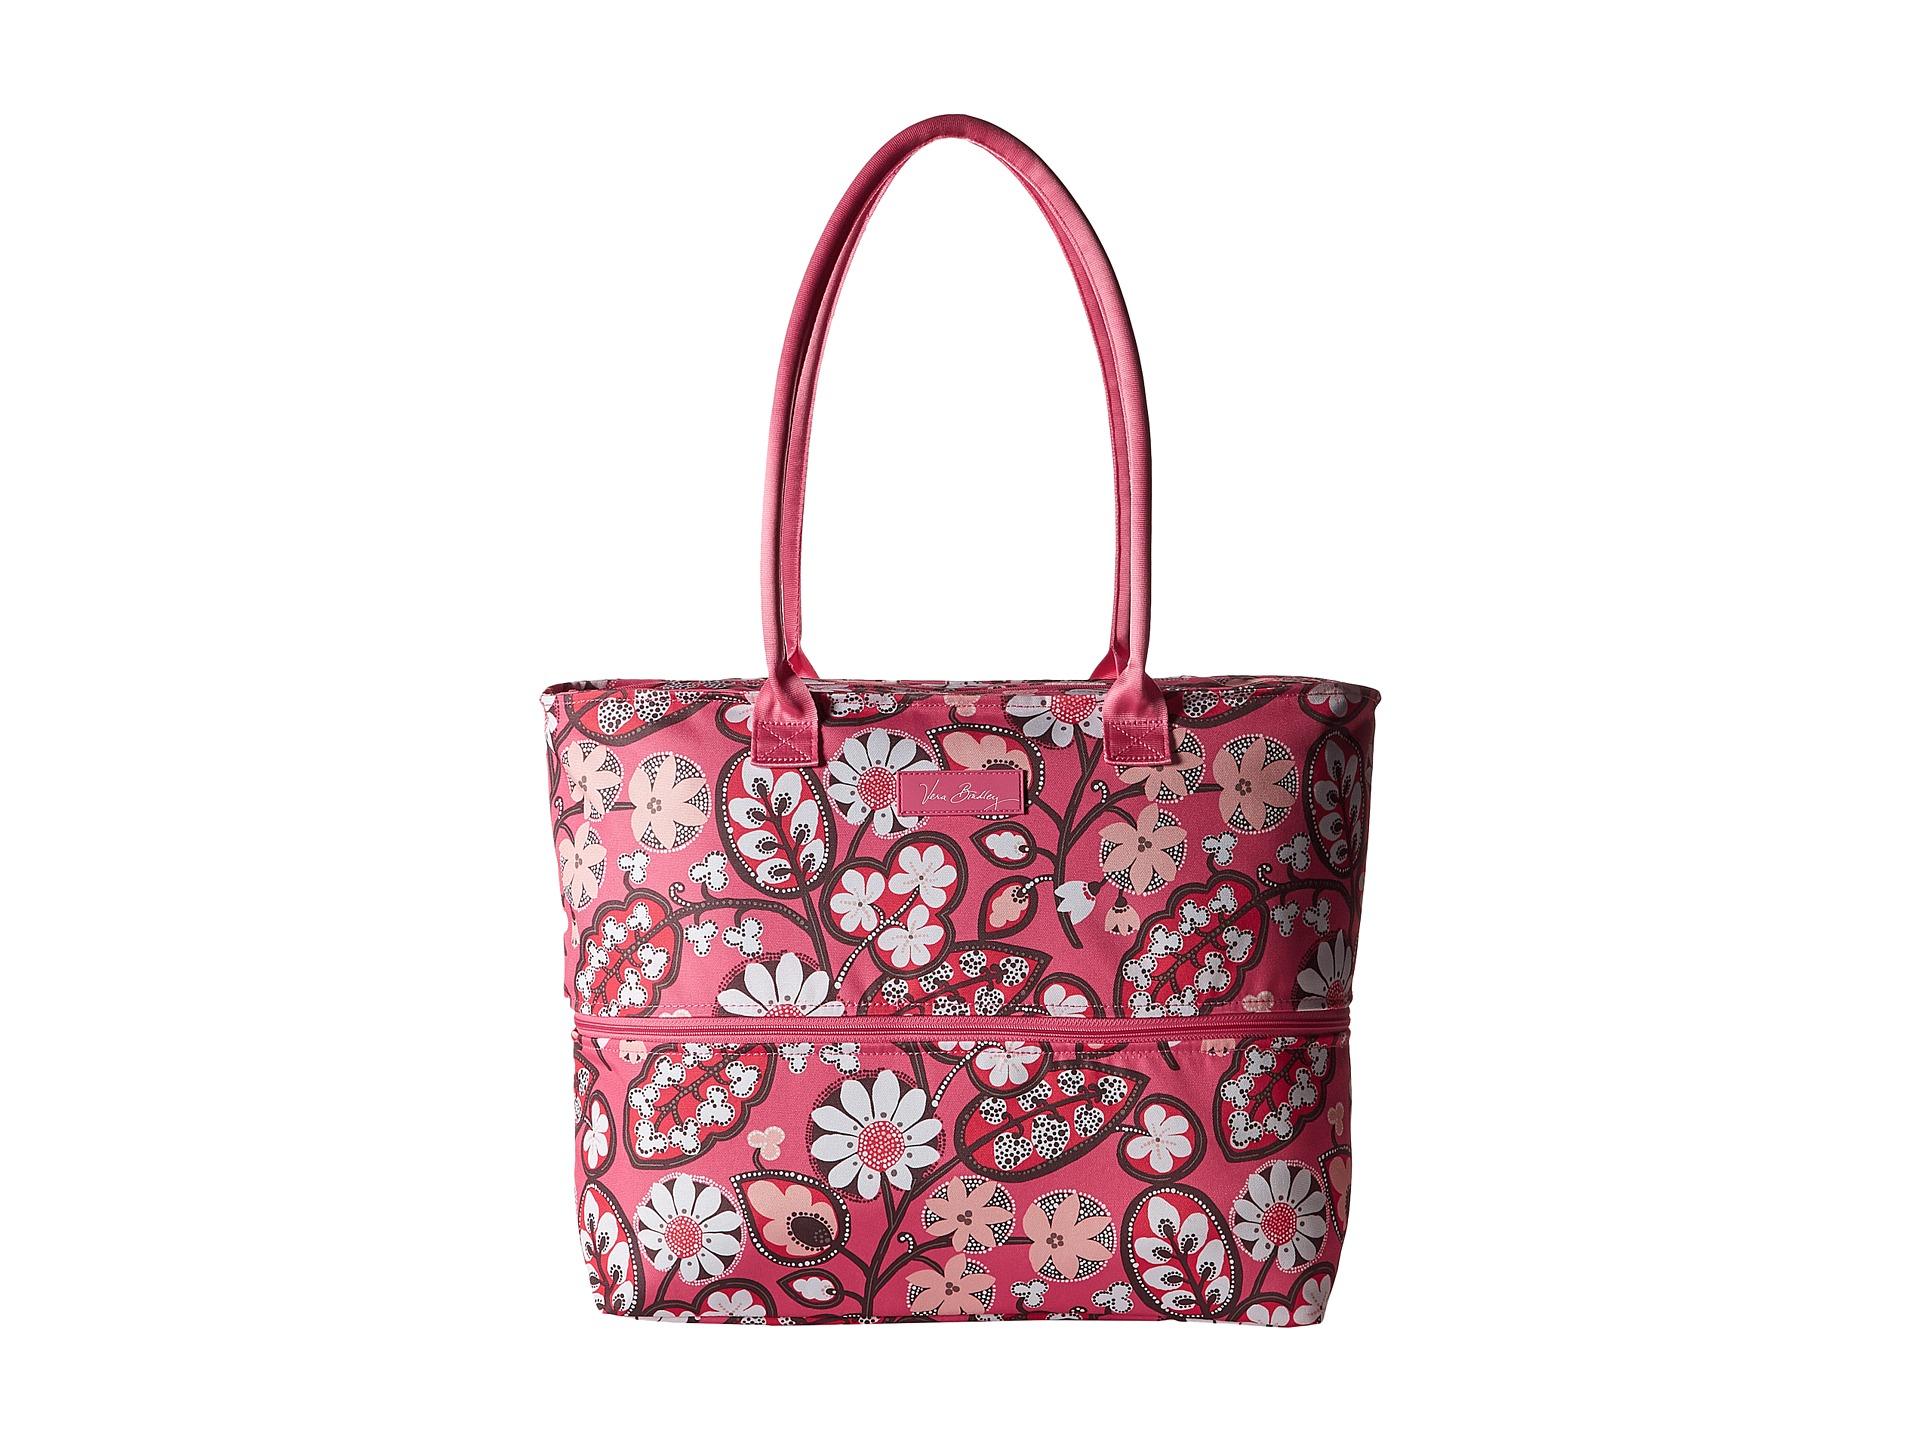 Vera bradley Lighten Up Expandable Travel Tote in Pink (Blush Pink ...